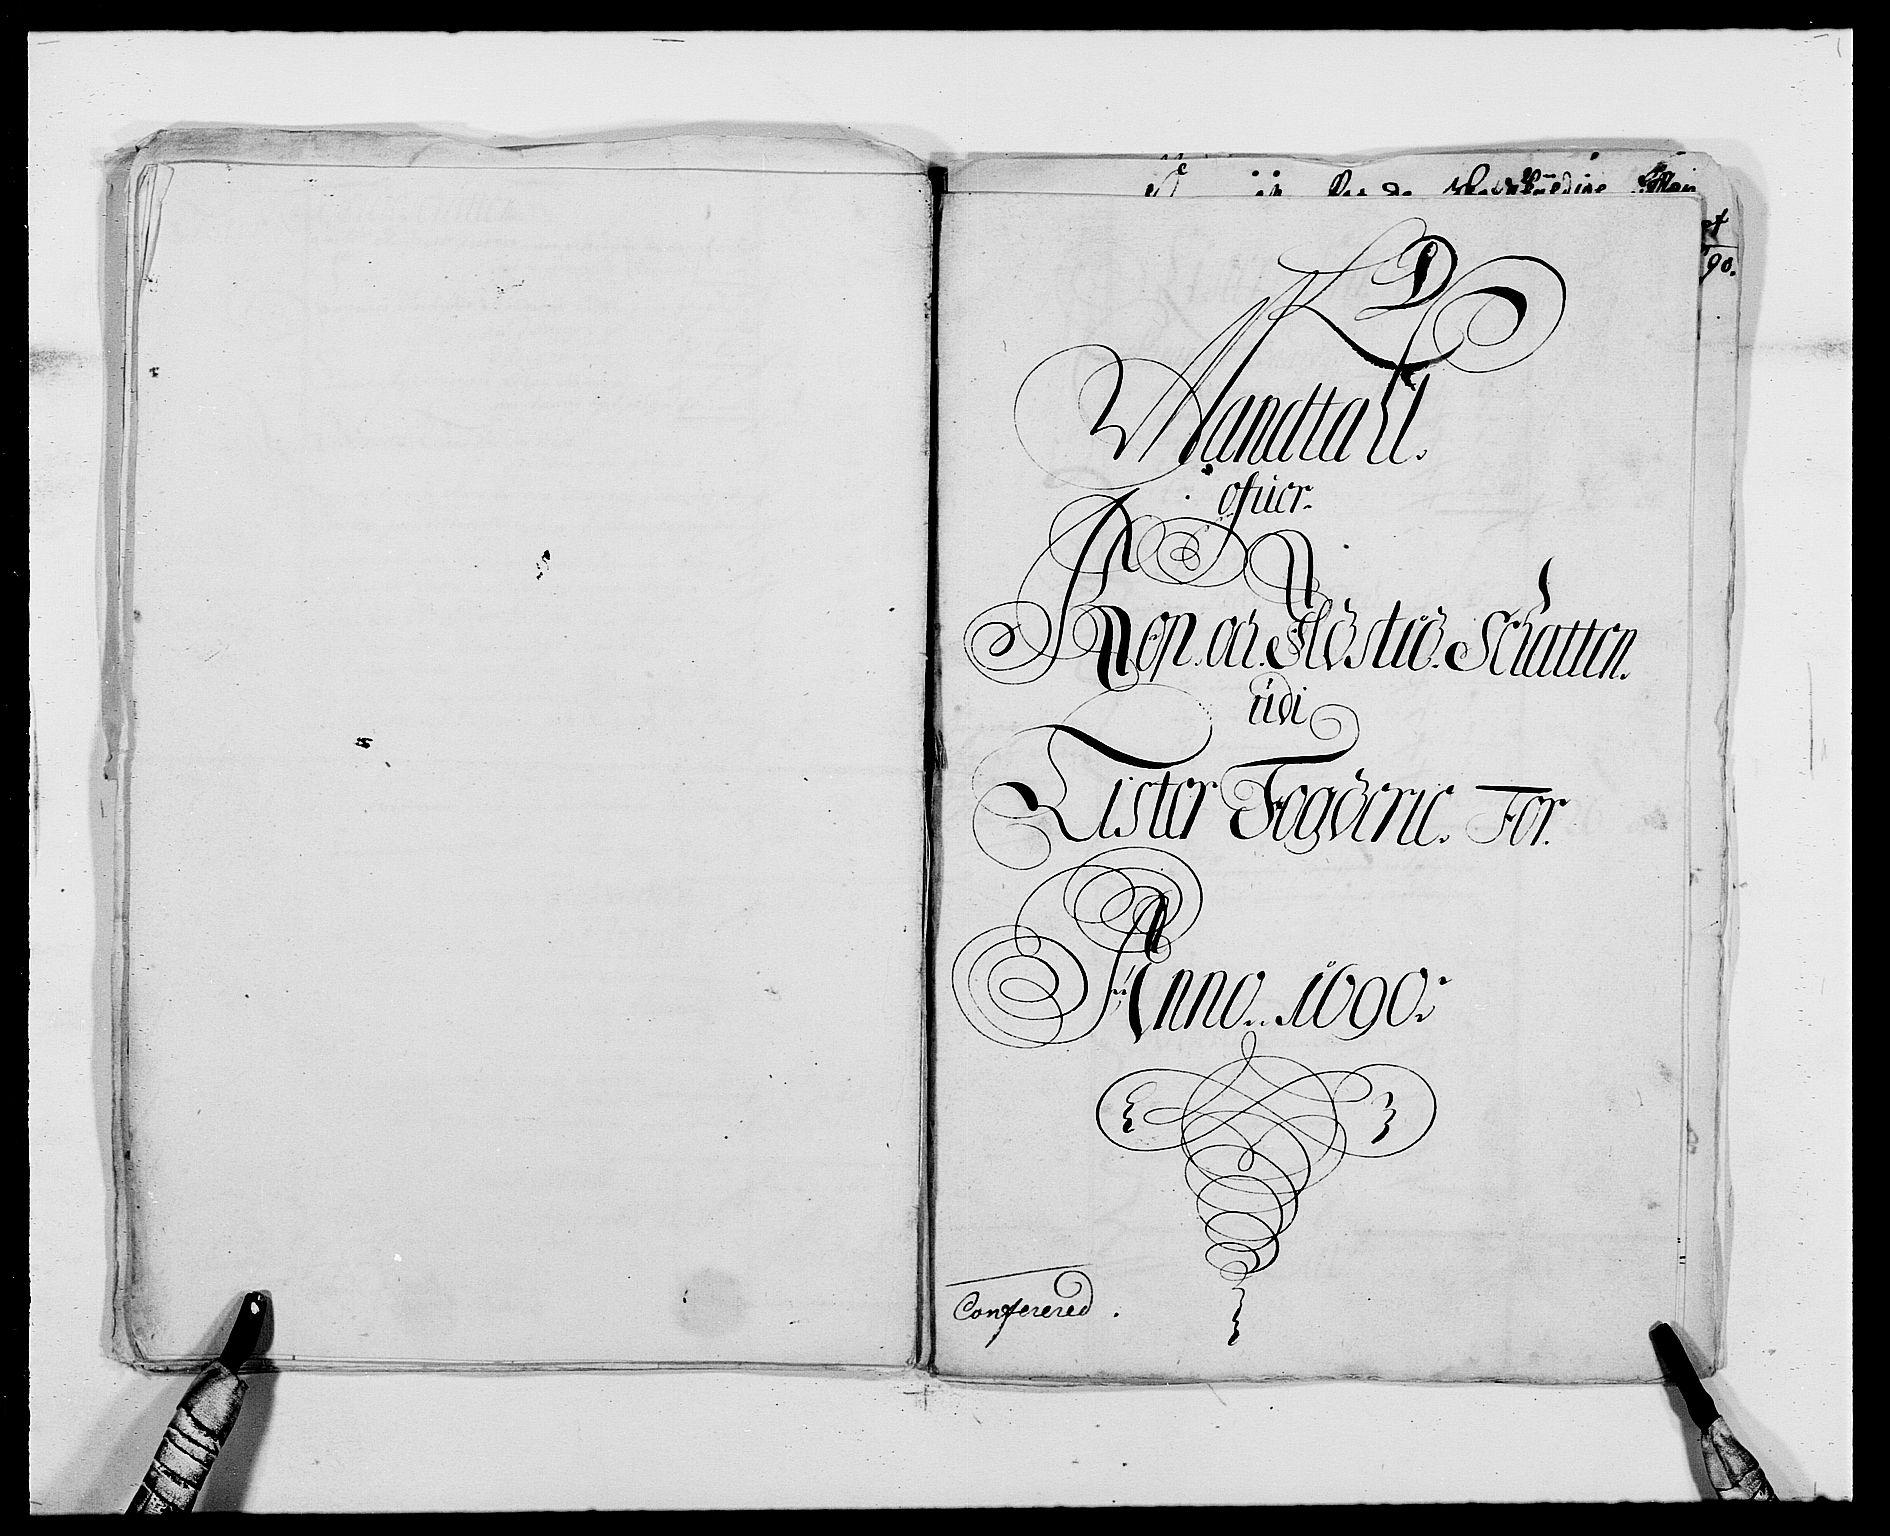 RA, Rentekammeret inntil 1814, Reviderte regnskaper, Fogderegnskap, R41/L2536: Fogderegnskap Lista, 1690-1693, s. 48